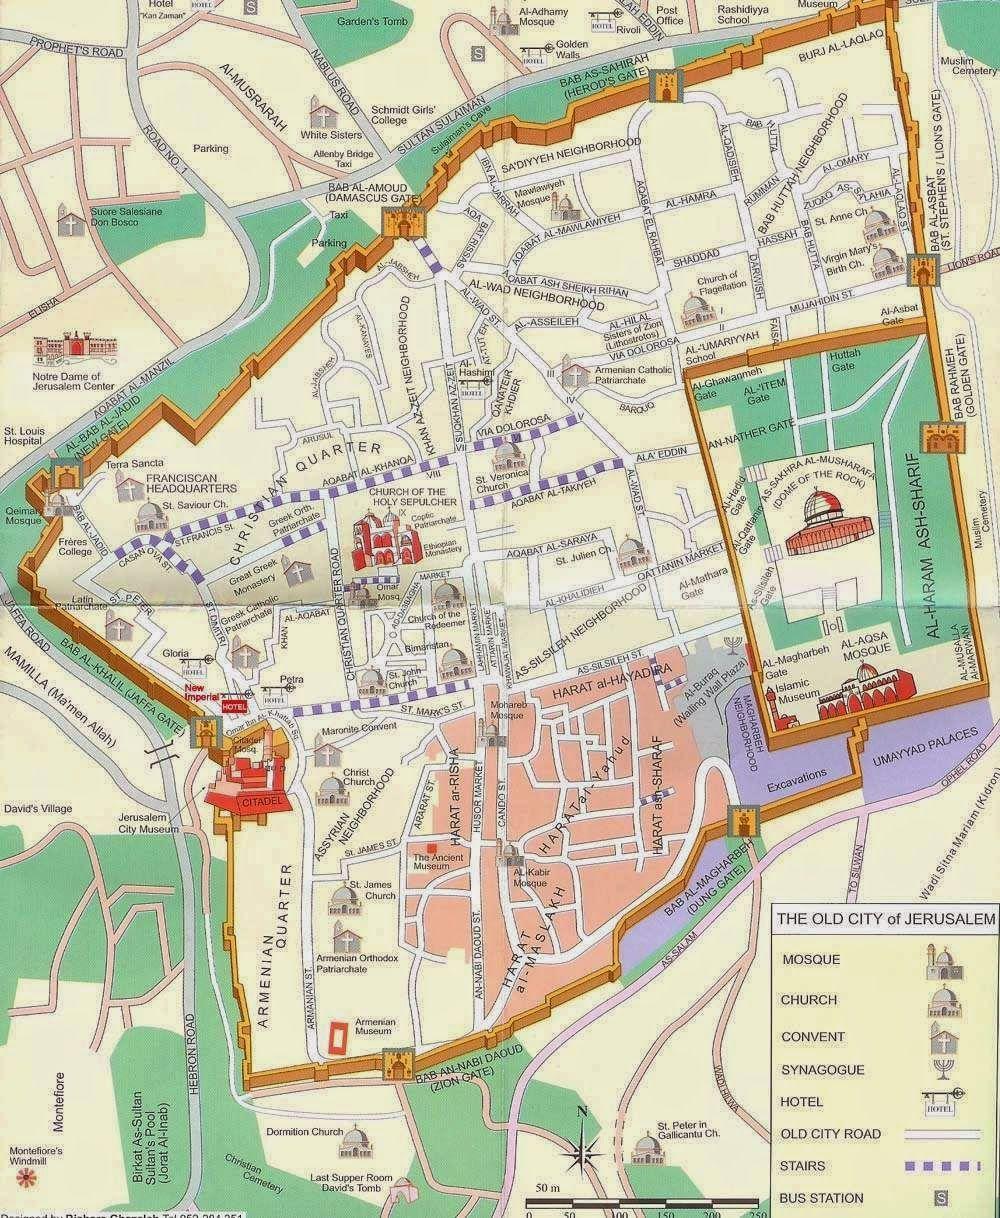 Map of Jerusalem Old City Walls and Jewish Quarter, Christian Quarter, Armenian  Quarter, and Muslim Quarter.